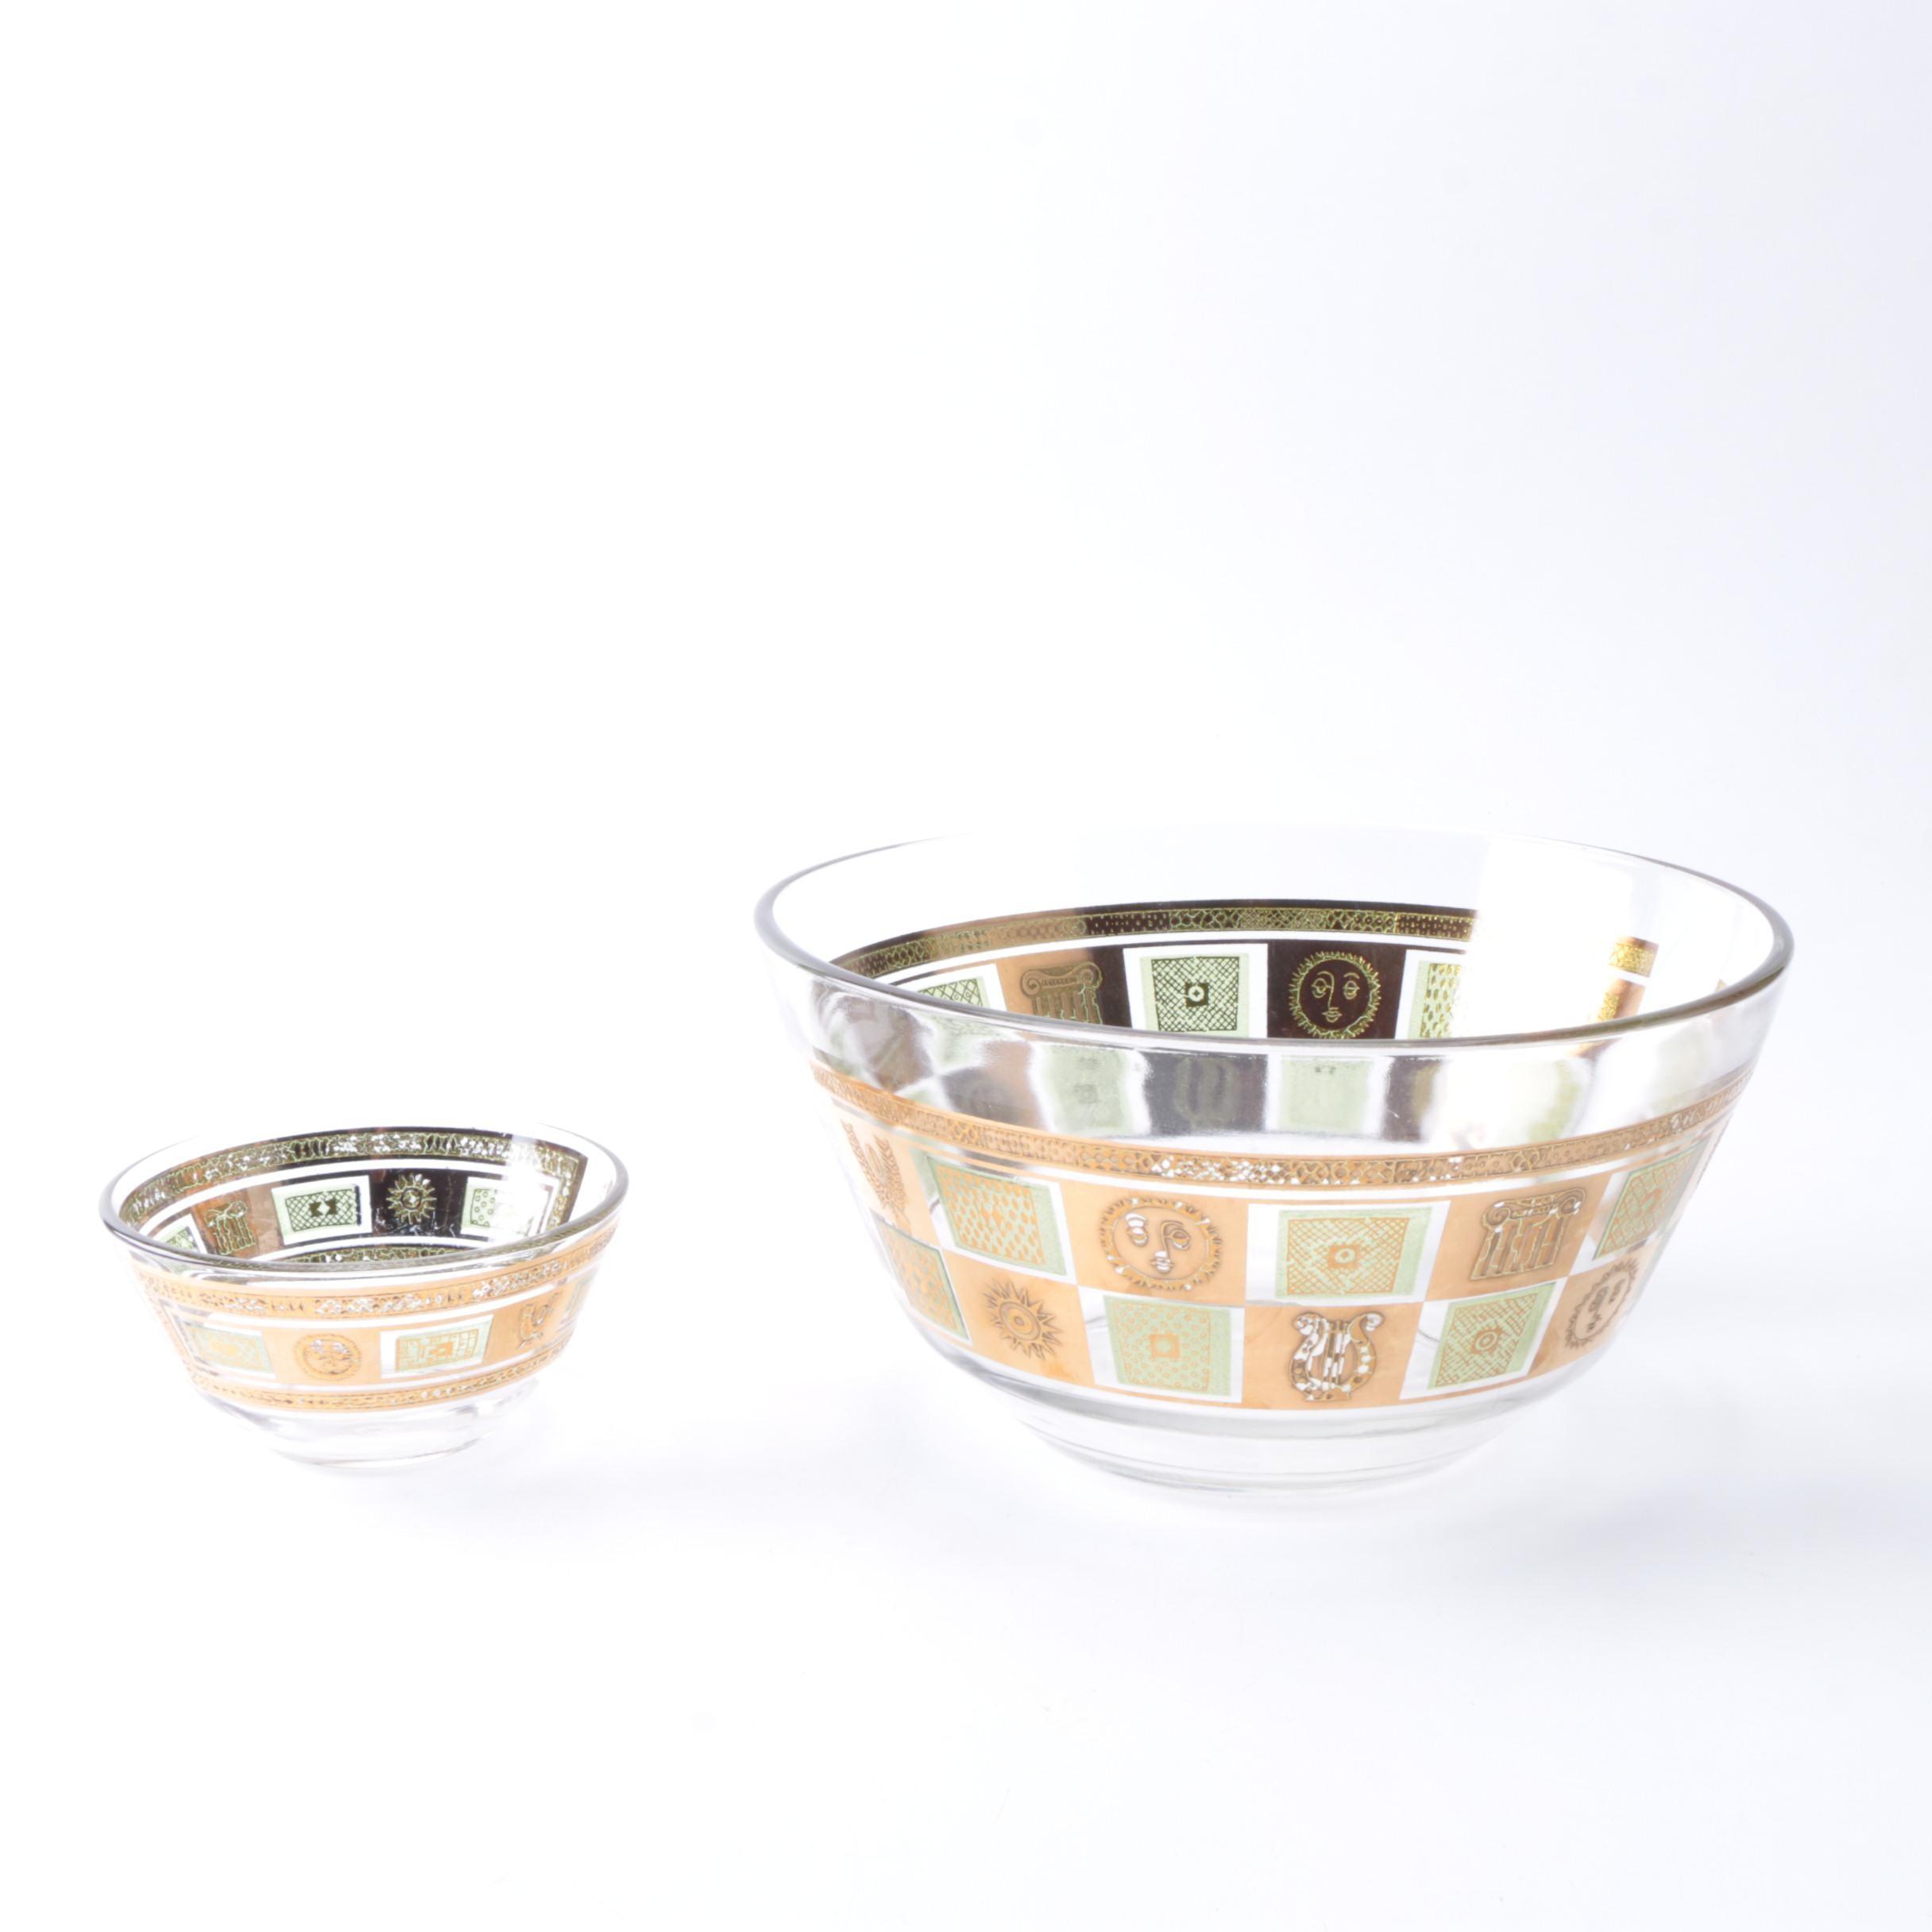 "Vintage Georges Briard ""Celeste"" Glass Bowls"